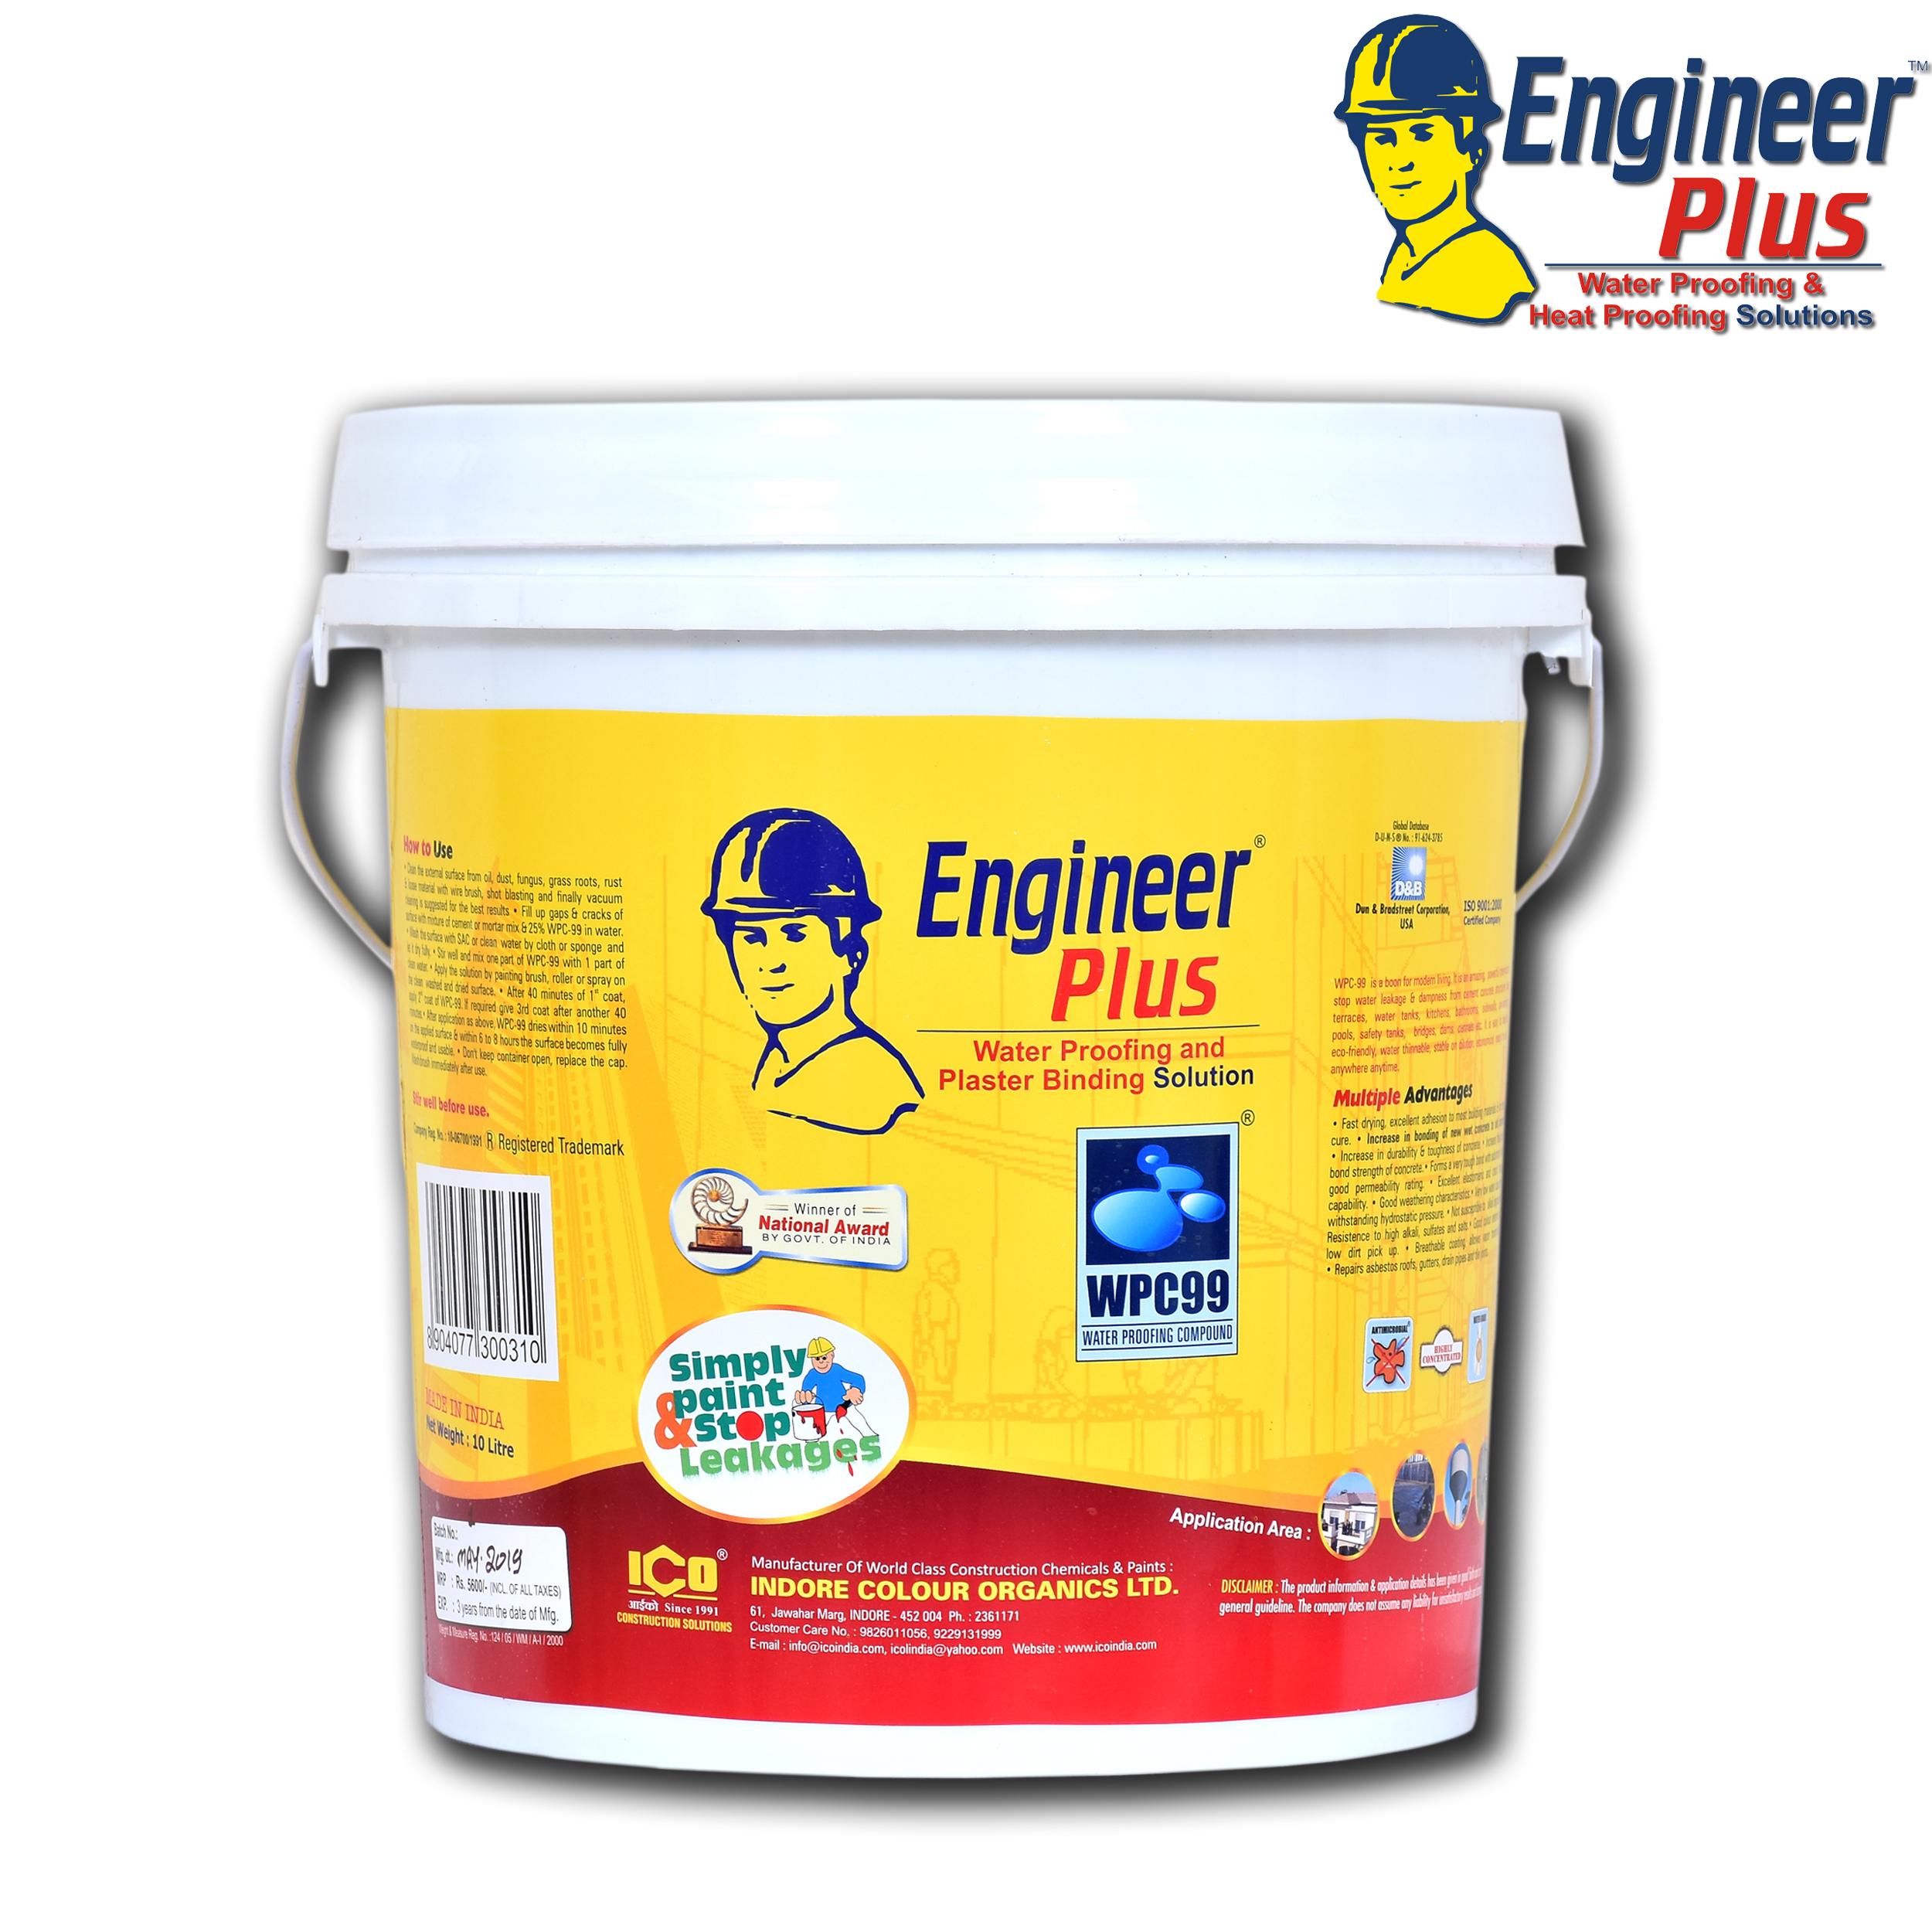 WPC 99 Waterproofing Chemicals